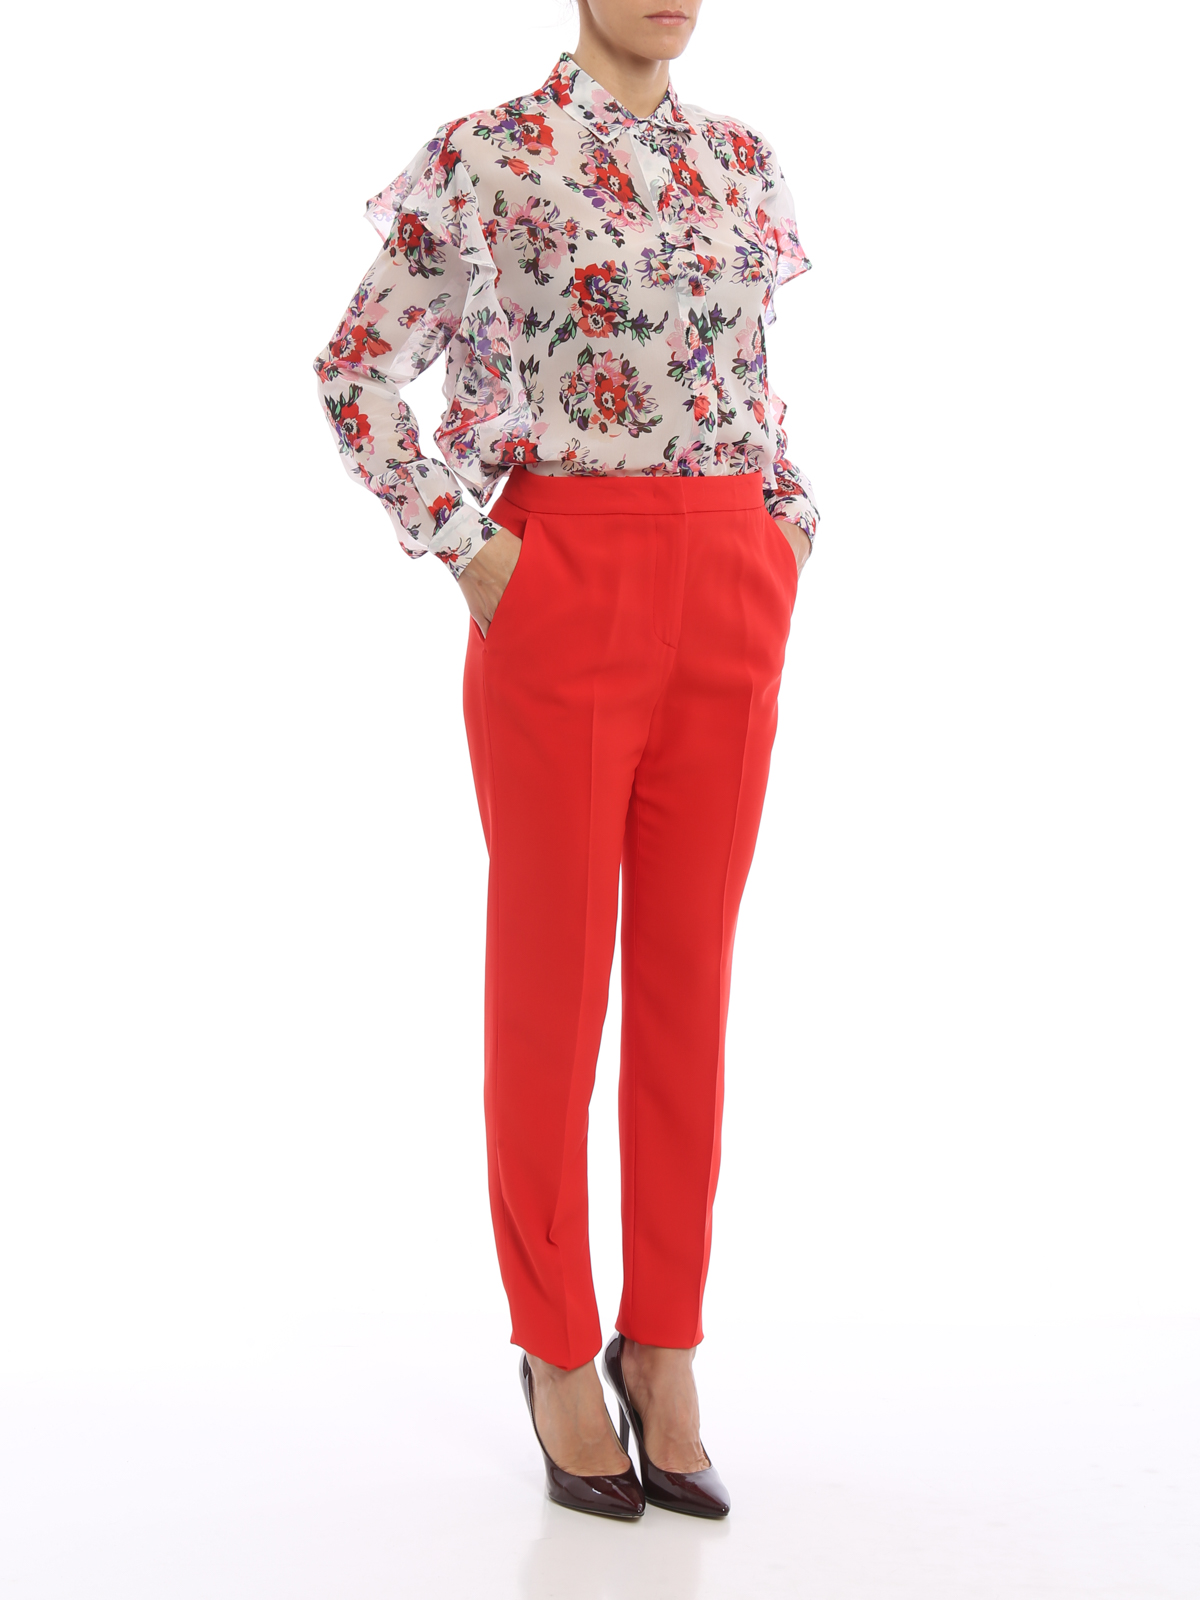 Sacrificio Traidor Bosque Pantalon Vestir Rojo Mujer Ocmeditation Org